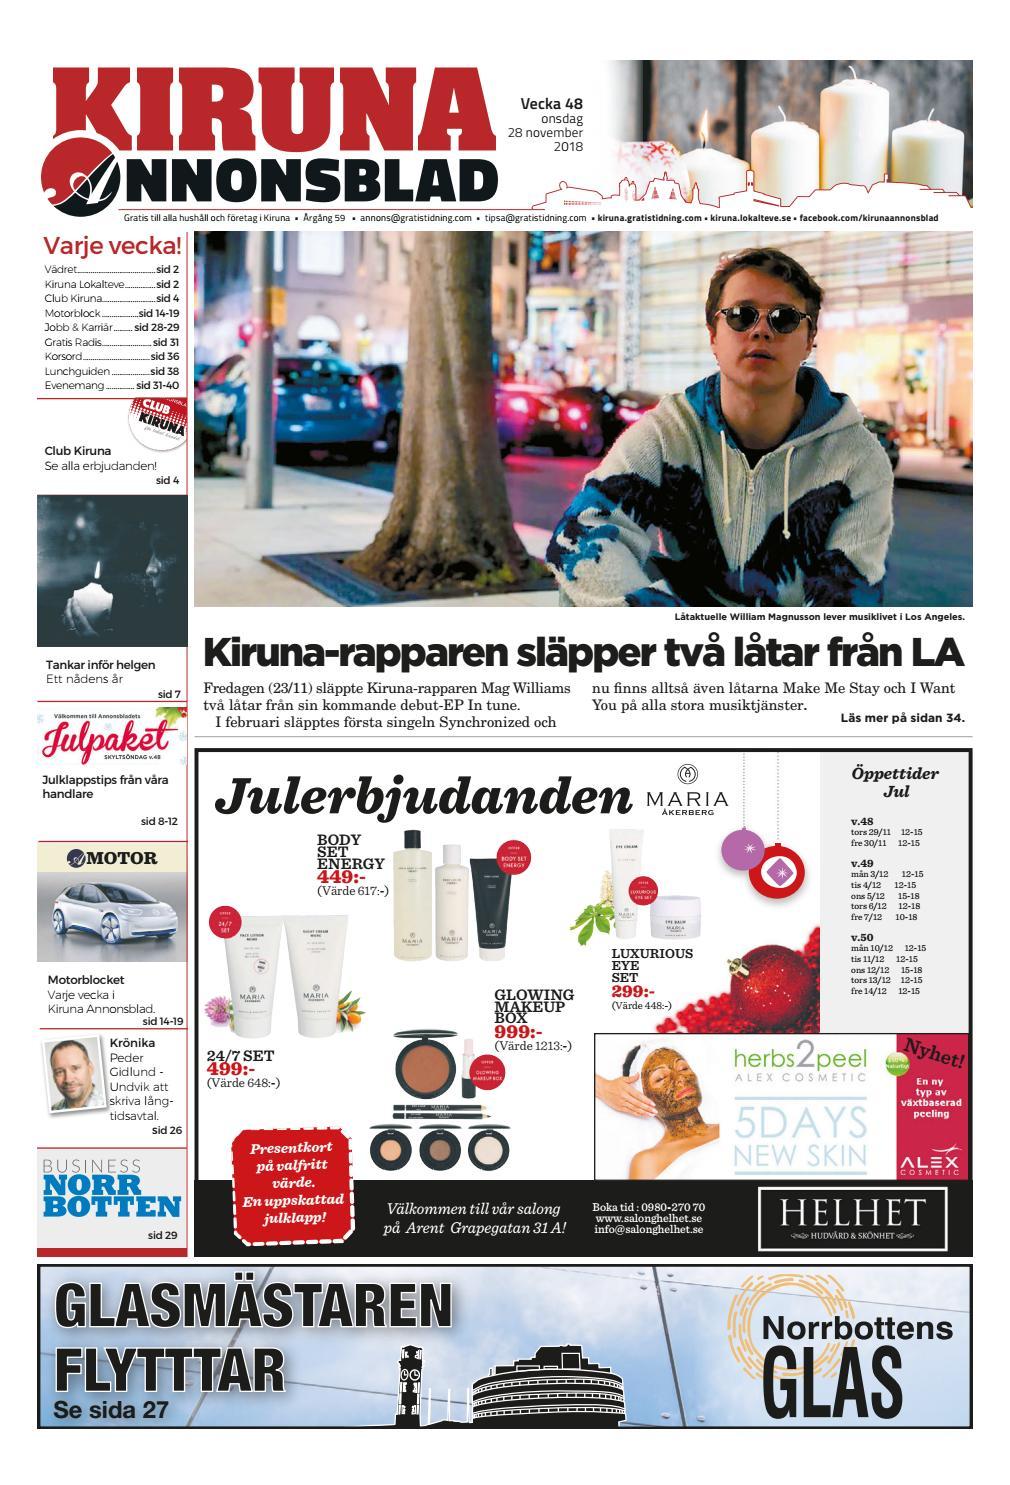 Kiruna Annonsblad vecka 48 193ac42f02aca